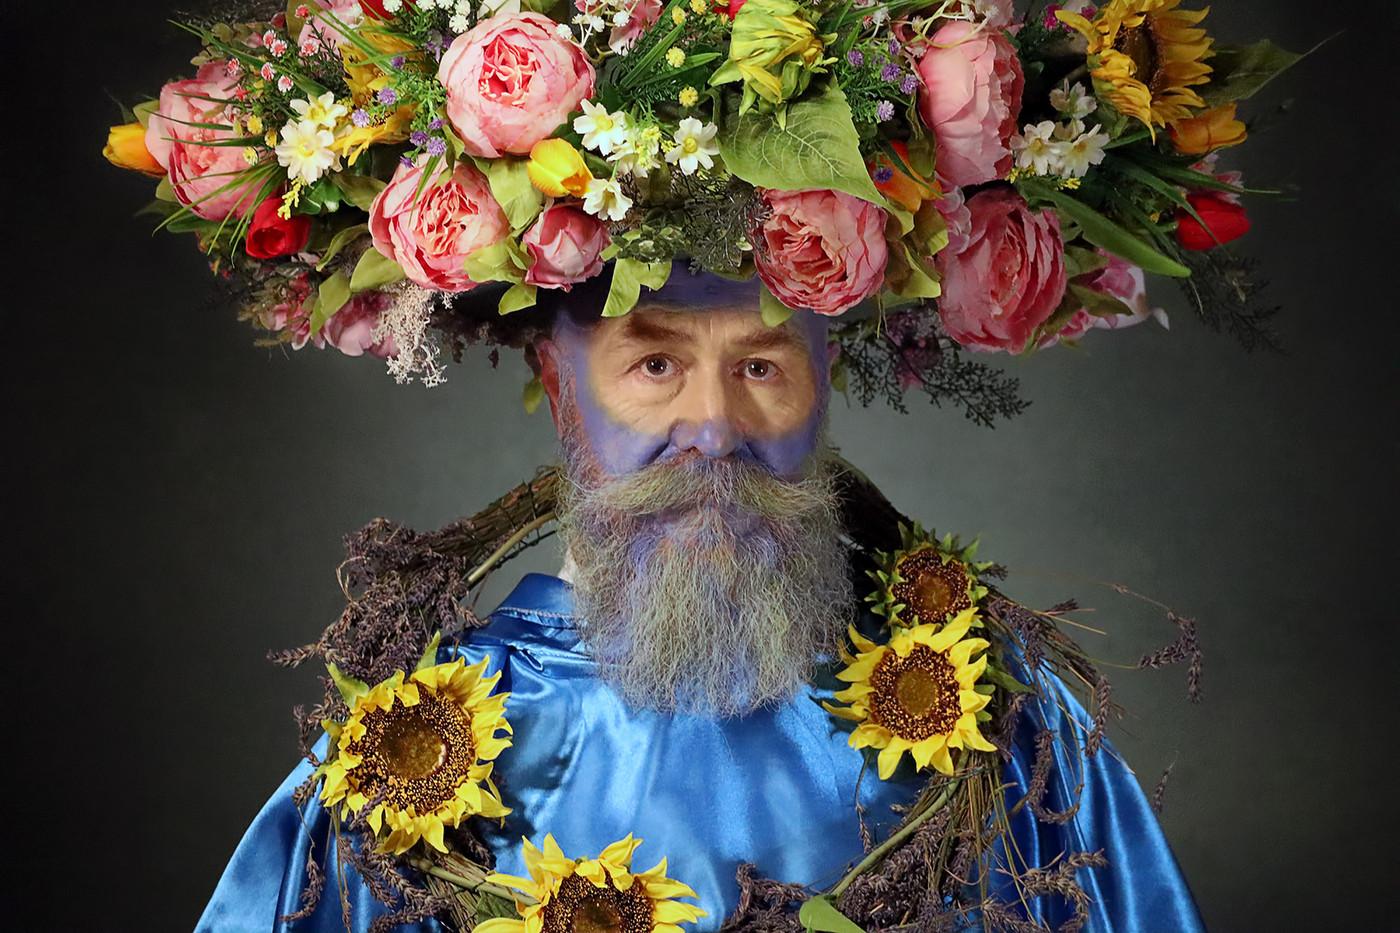 17 FLOWER POWER by Pam Sherren